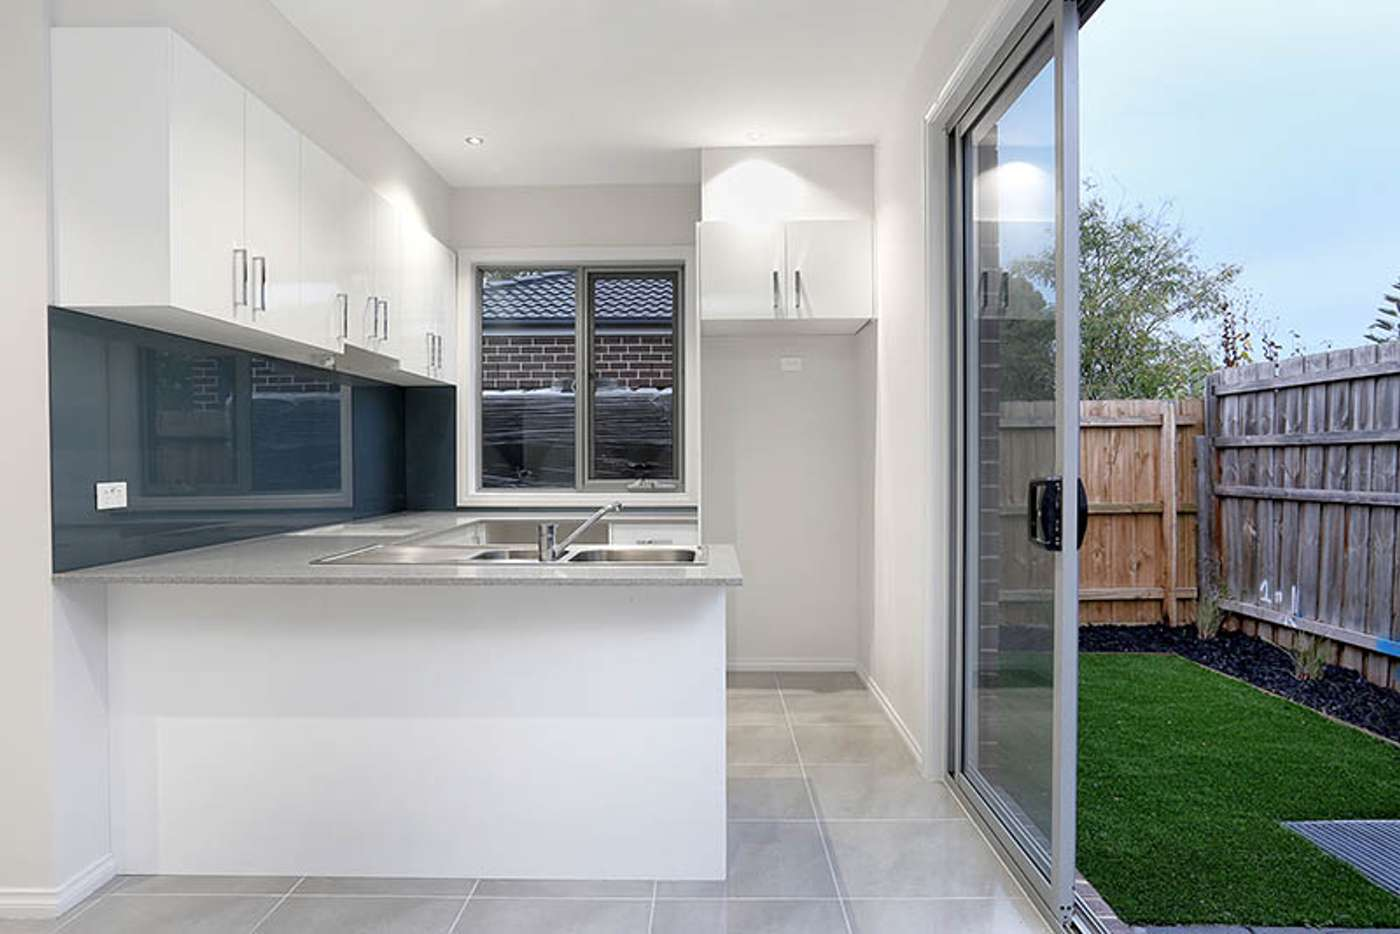 Main view of Homely unit listing, 3/29 Hilda Street, Glenroy VIC 3046